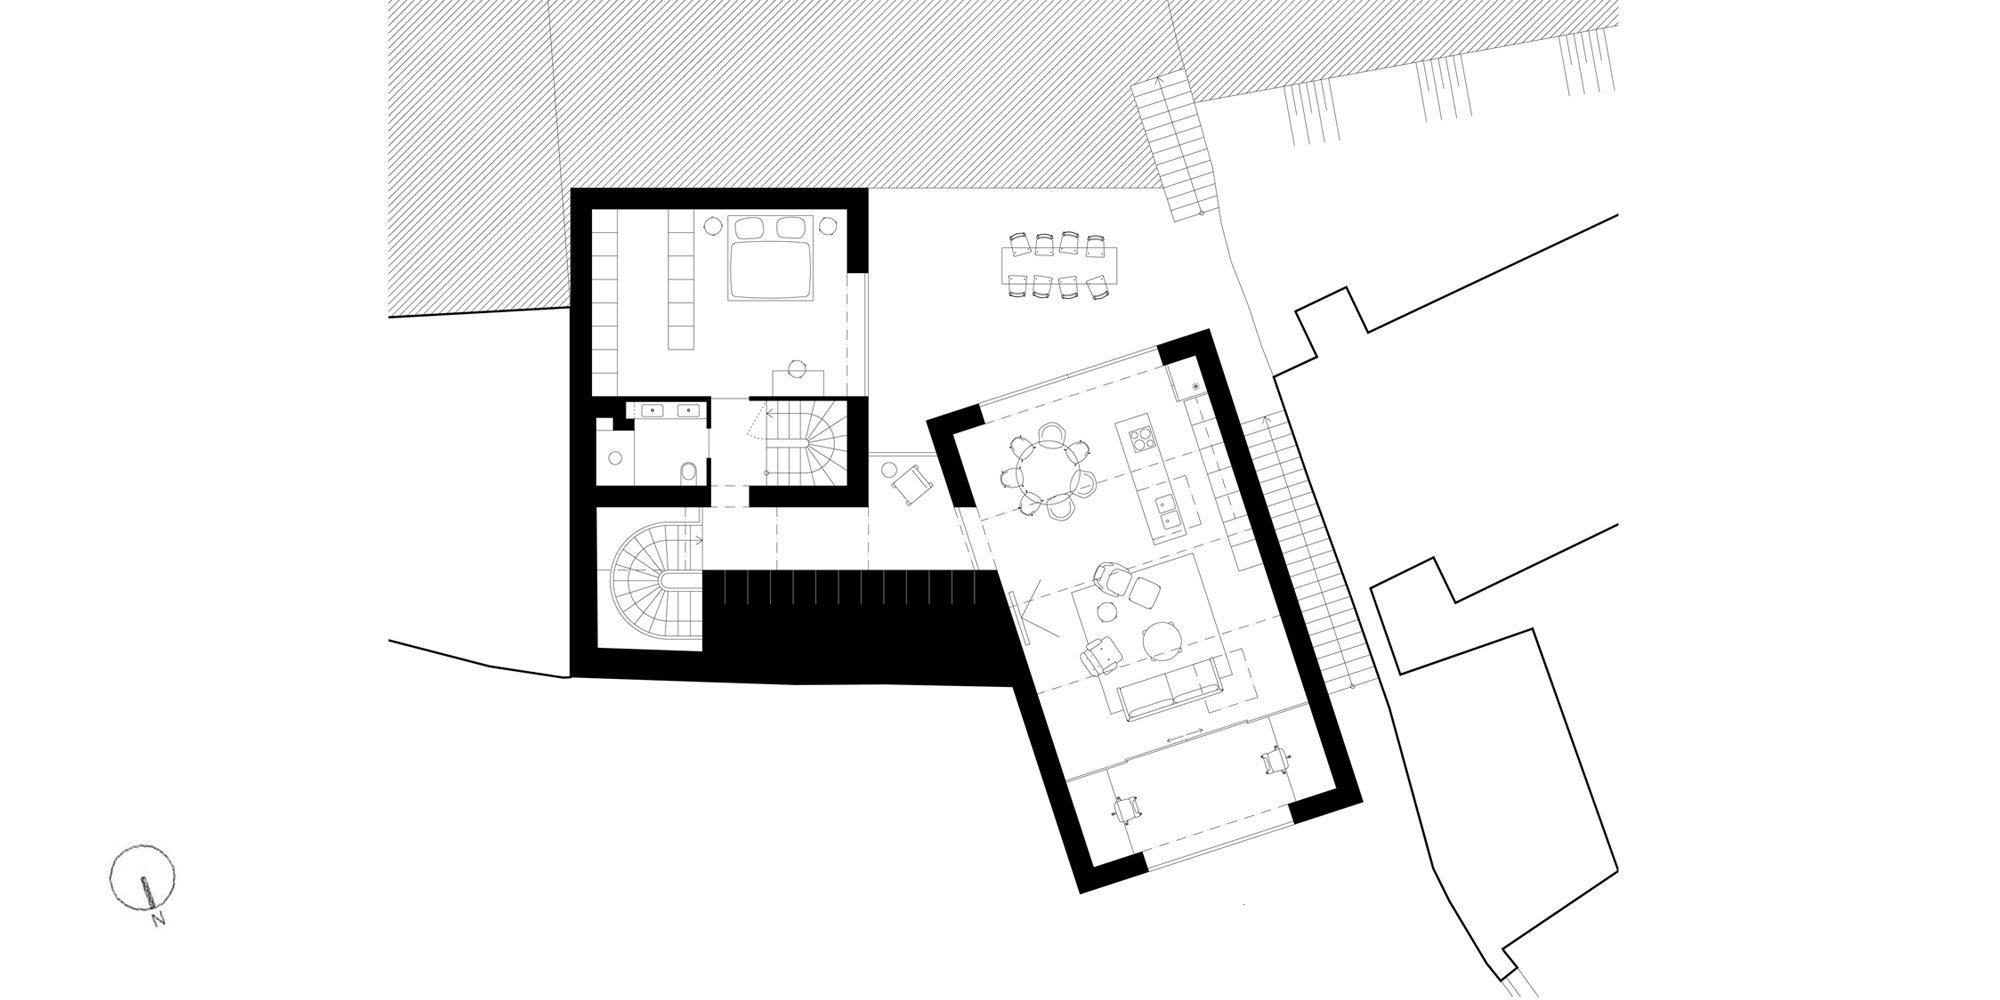 Pianta piano primo © Atelier 111 architekti